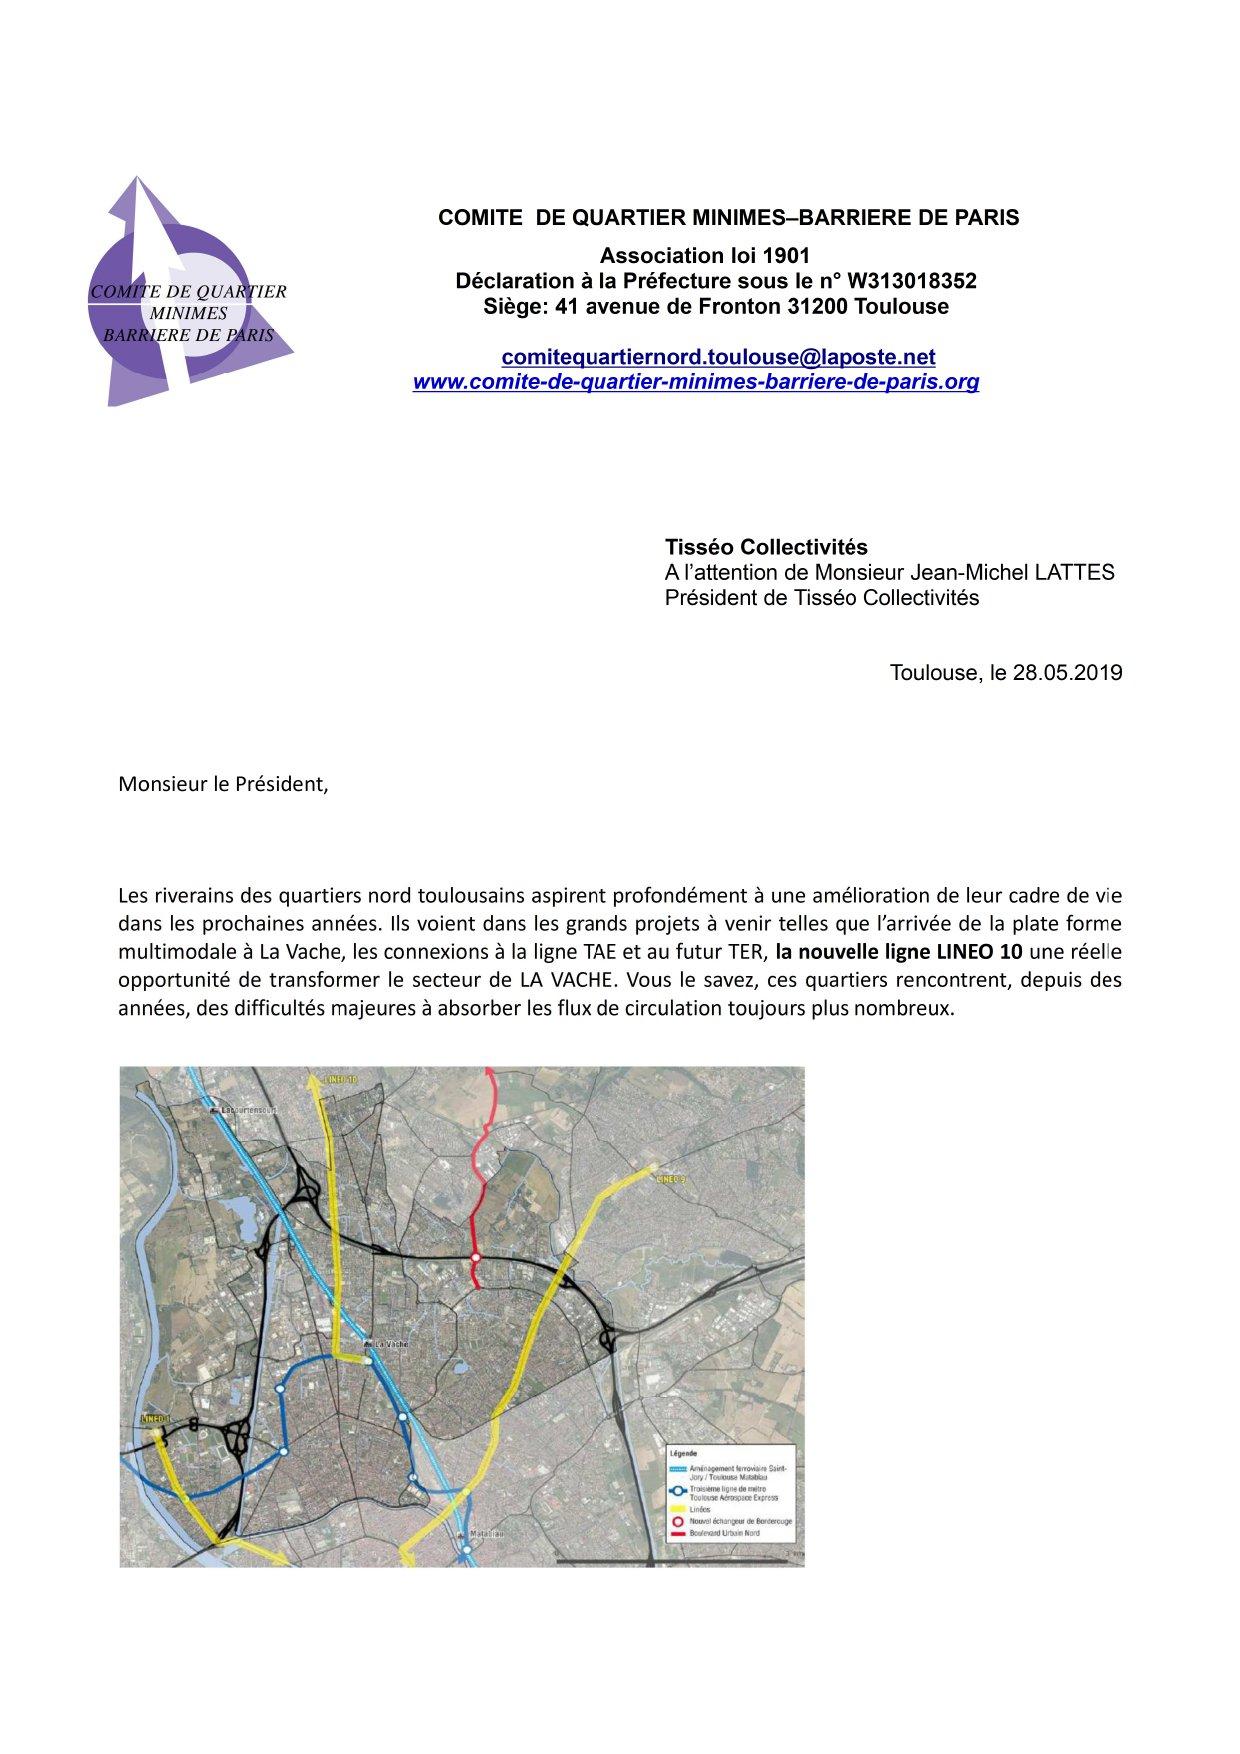 LINEO 10 concertation 28 05 2019_000001